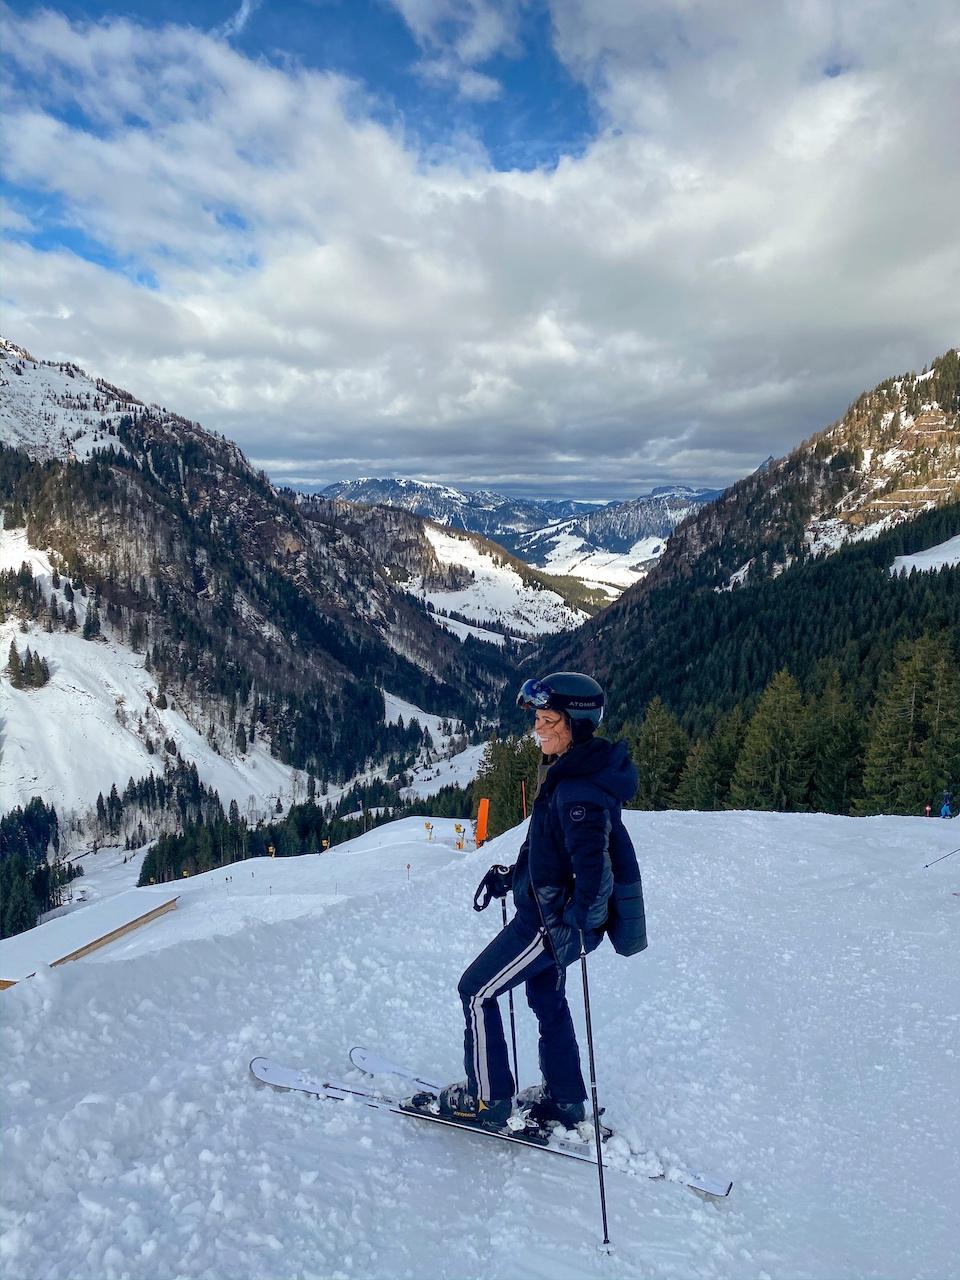 Wintersport Saalbach - Hinterglemm 2020 - Chloe Sterk